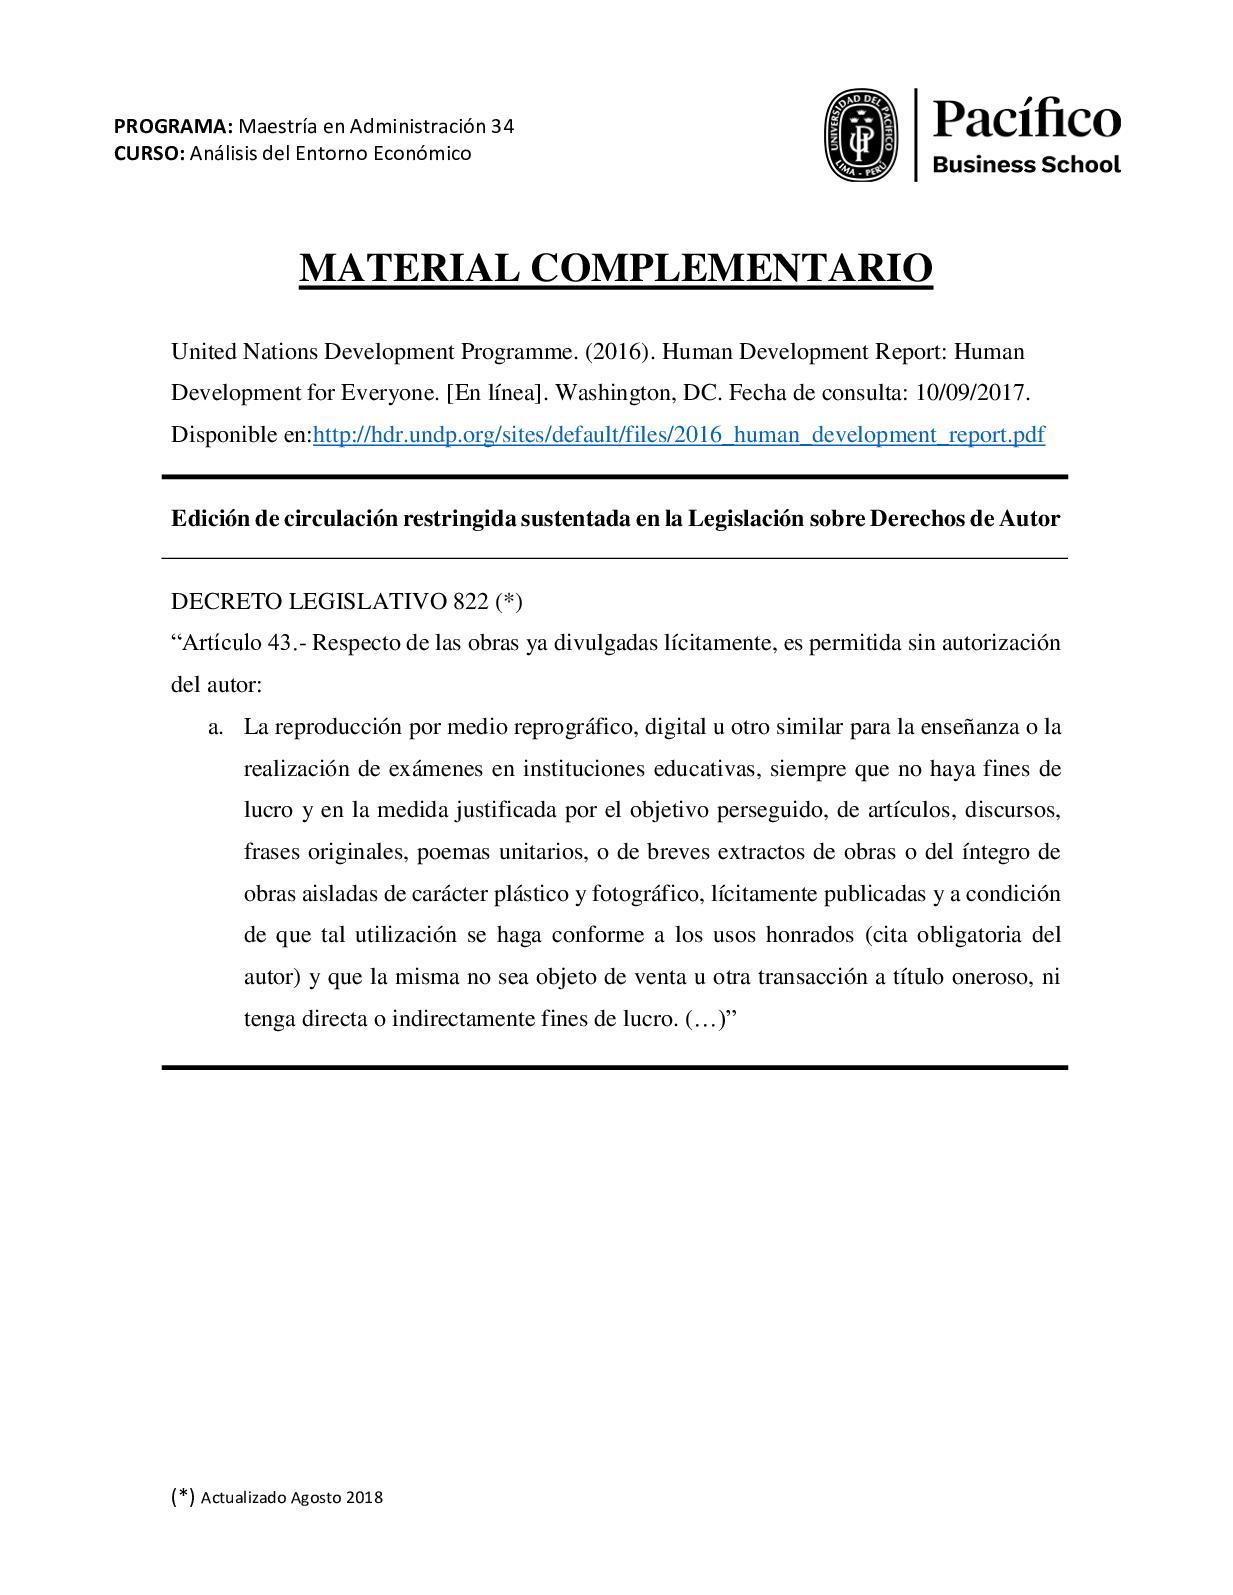 DECRETO 44844 PDF DOWNLOAD